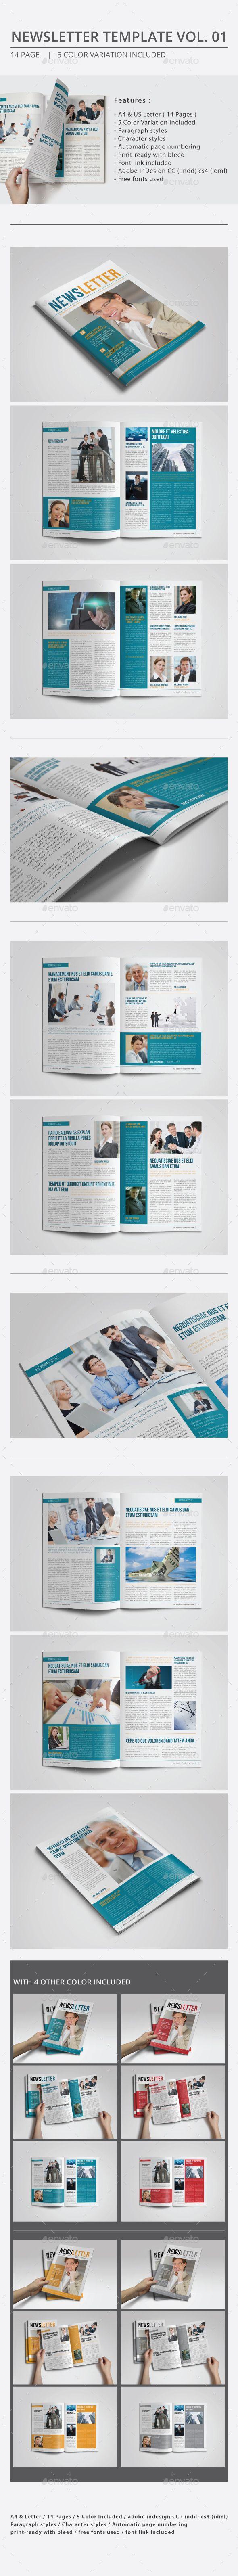 Newsletter Template Vol.01 - Newsletters Print Templates Download here : https://graphicriver.net/item/newsletter-template-vol01/10158059?s_rank=219&ref=Al-fatih